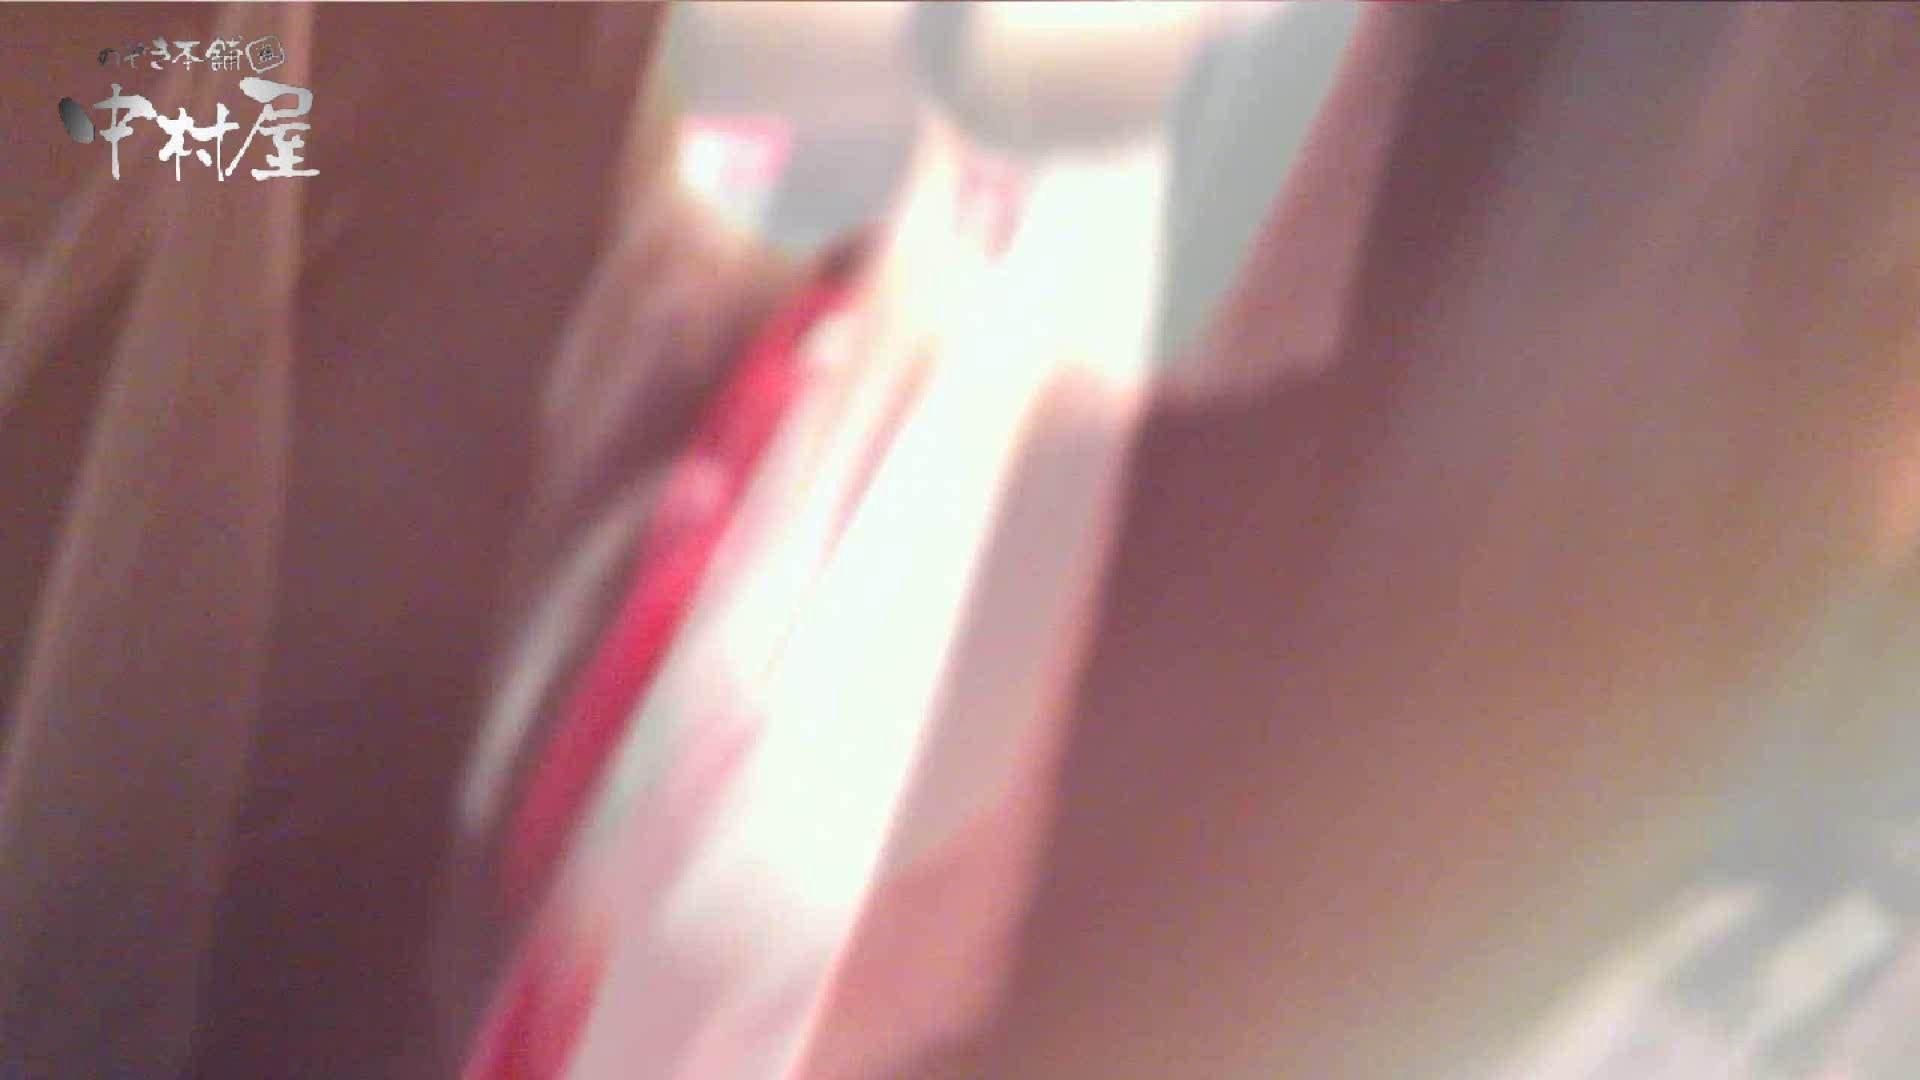 vol.47 カリスマ店員胸チラ&パンチラ 黒パン店員さん お姉さんの胸チラ ヌード画像 39連発 20